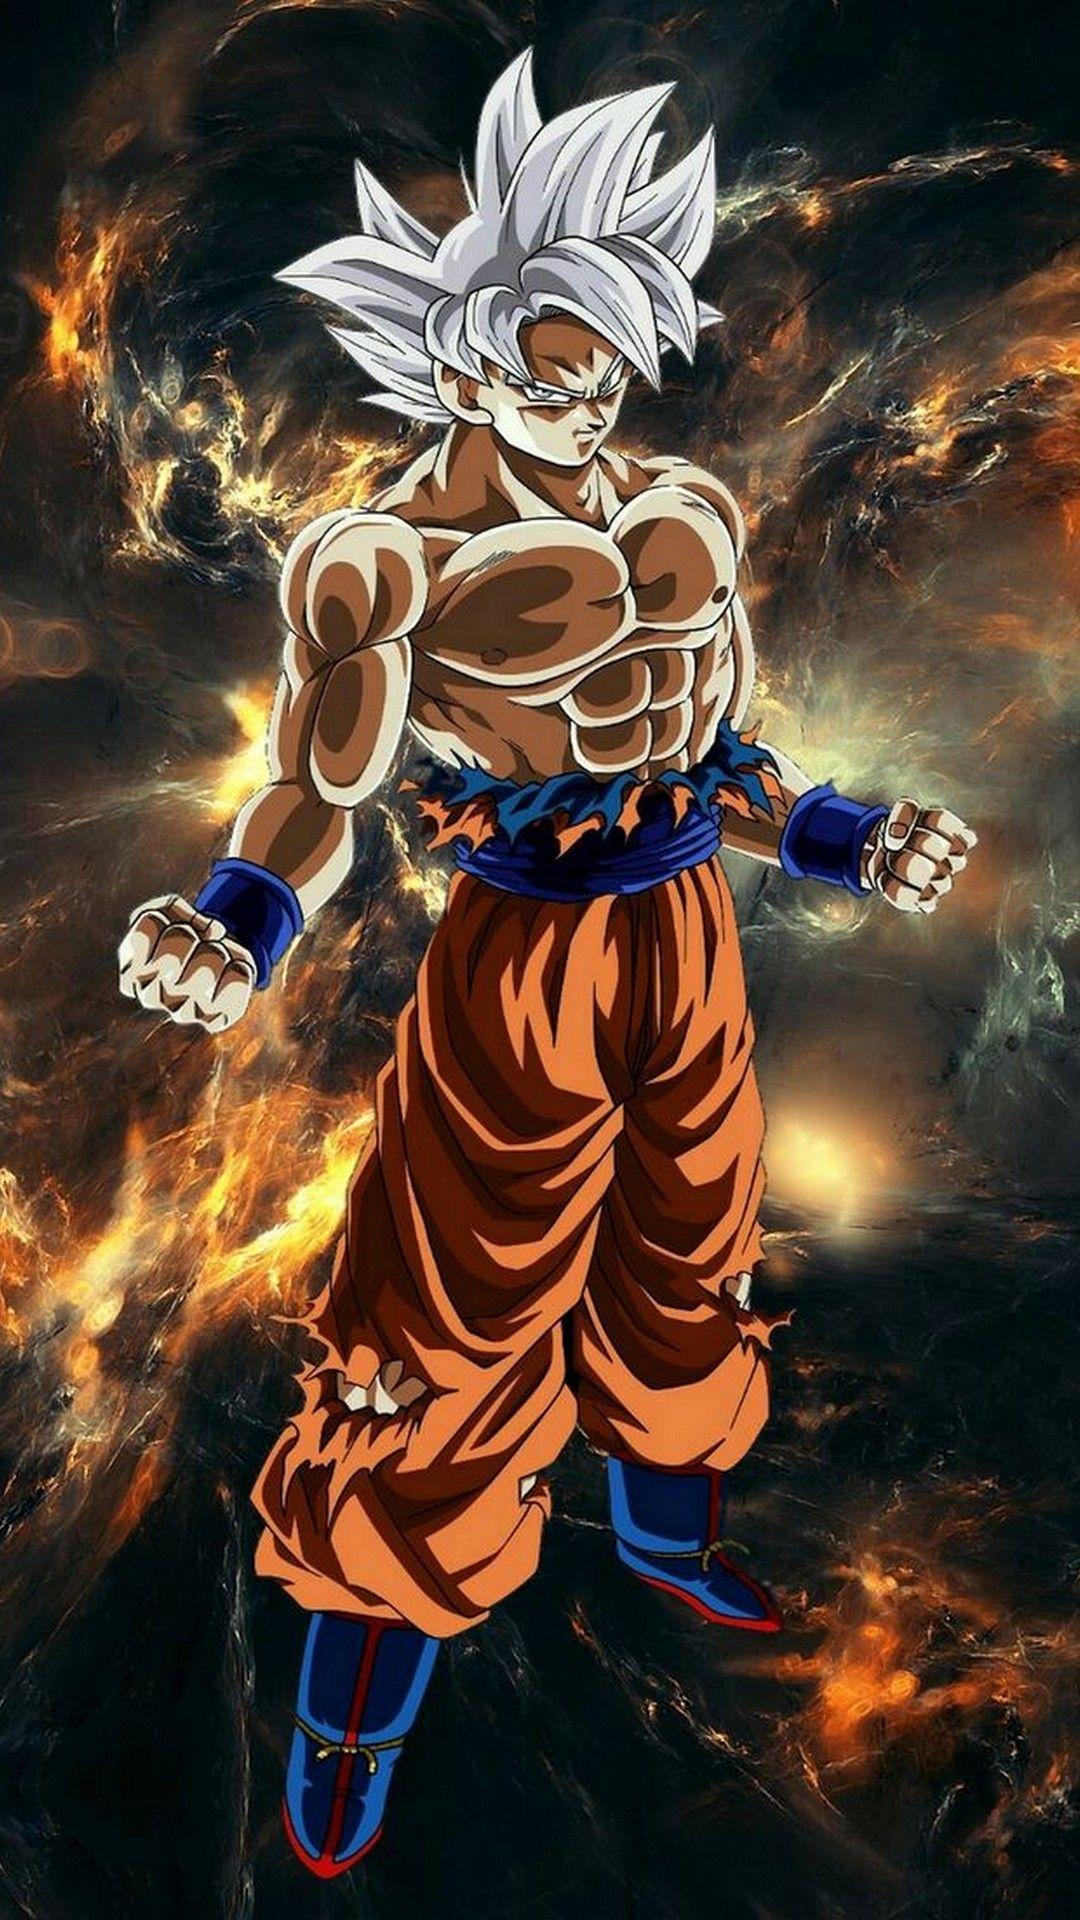 Android Dragon Ball Super Goku Wallpaper in 2020 Dragon